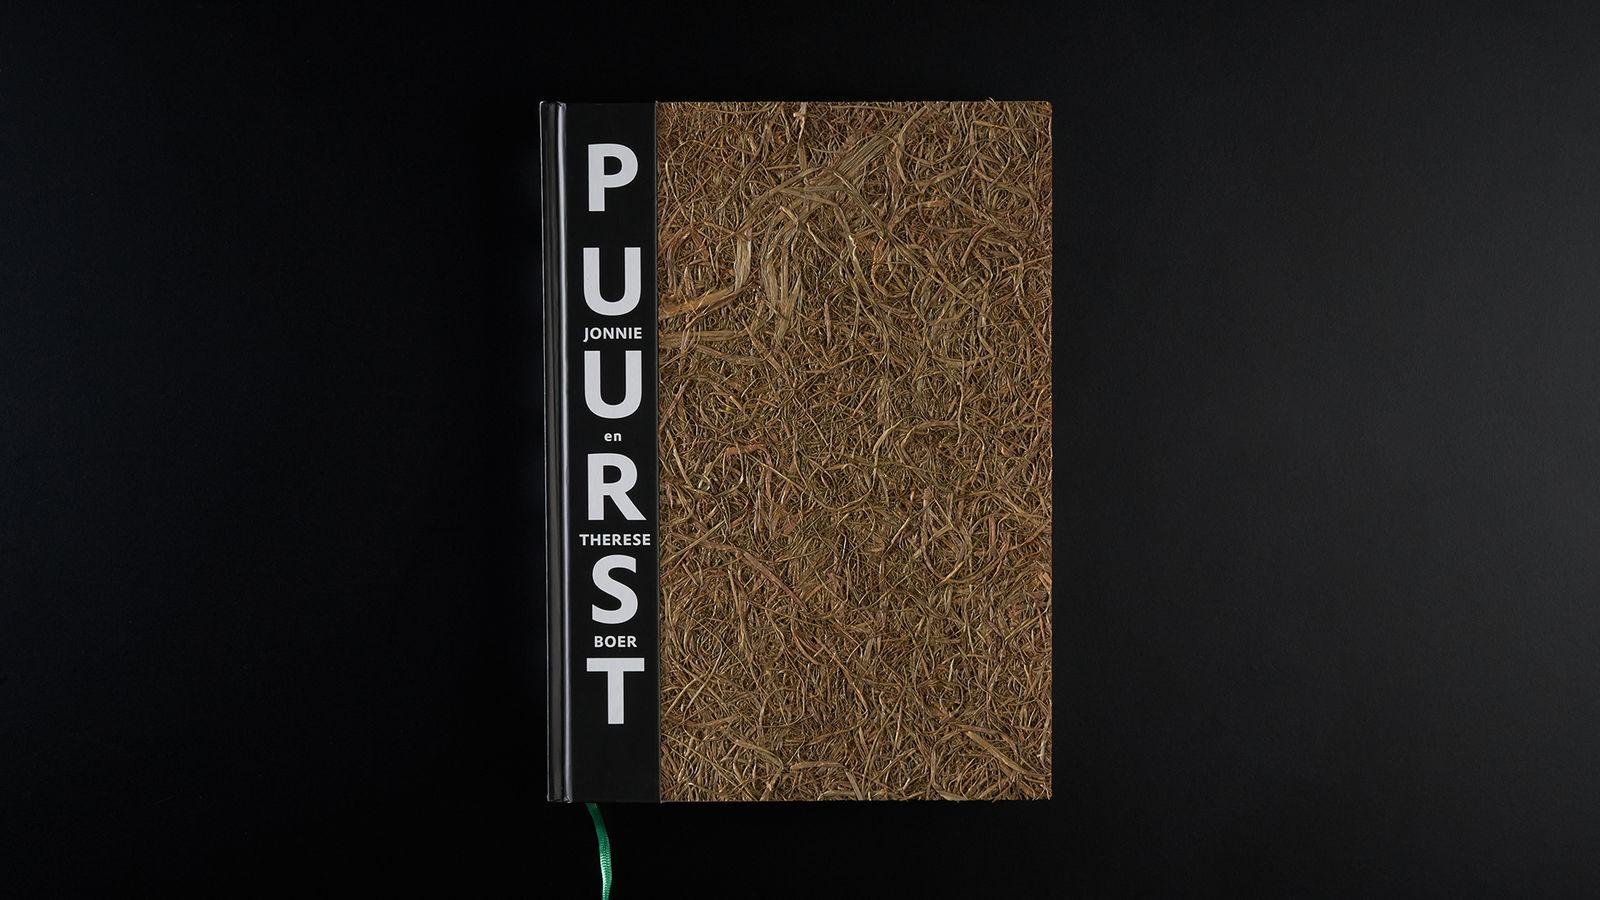 Puurst - Cover.jpg